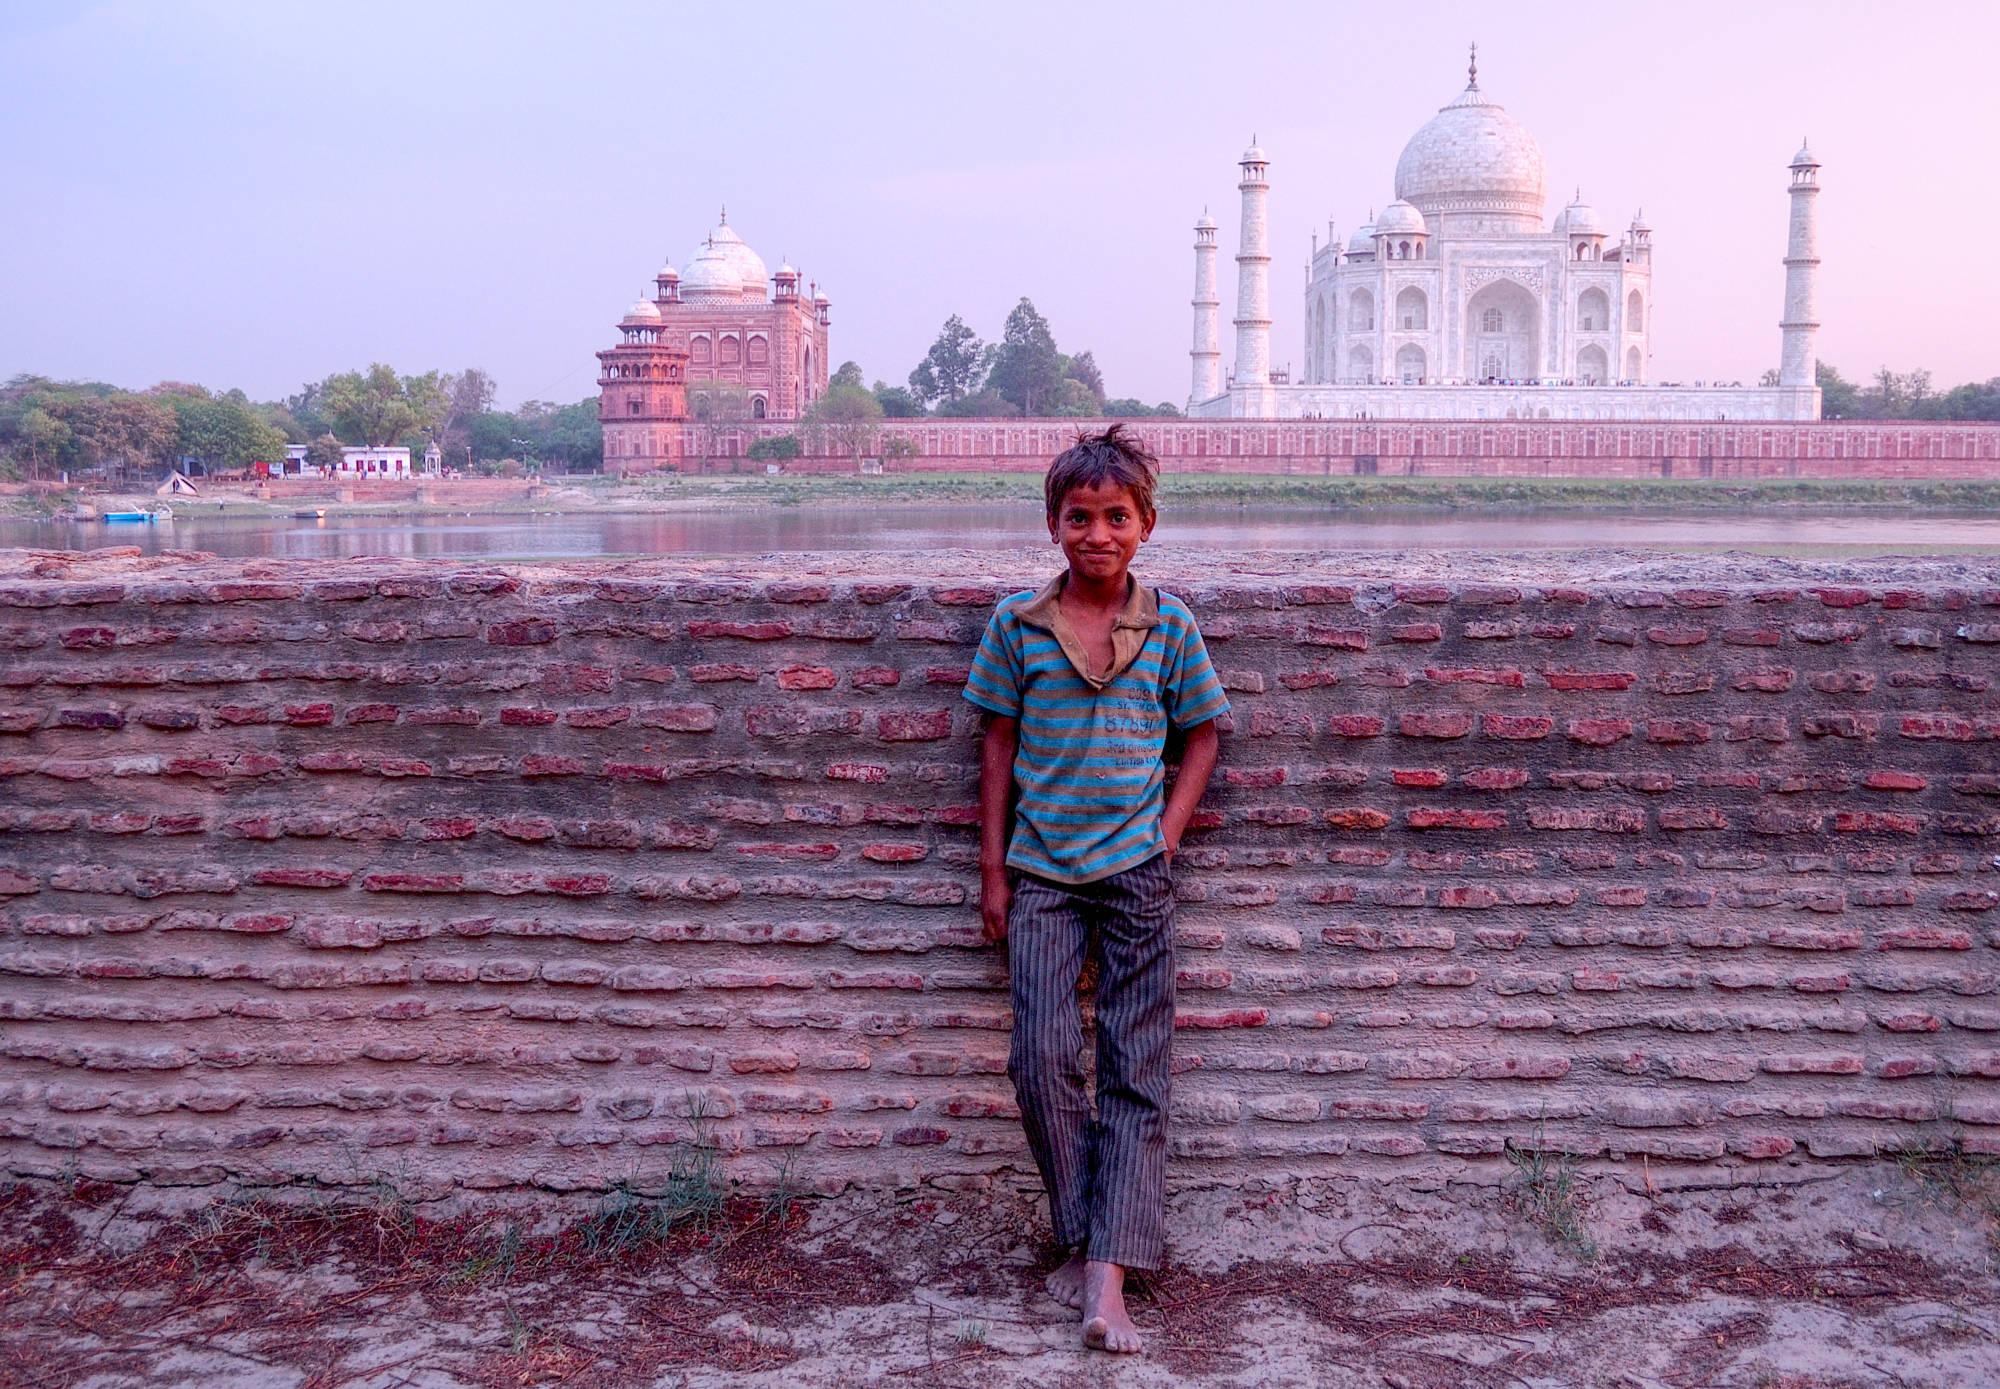 Boy across the river from the Taj Mahal